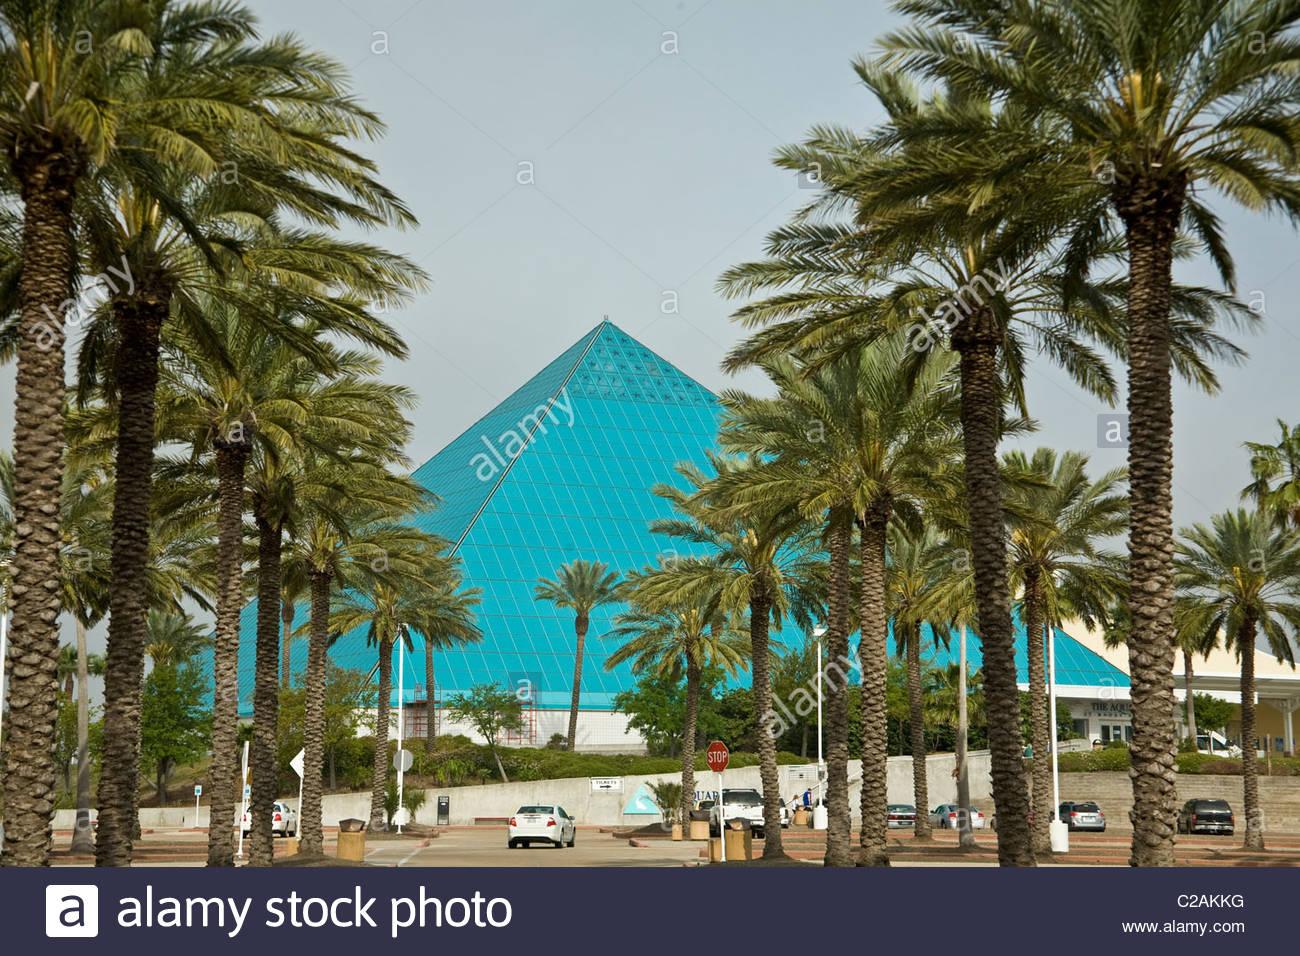 Moody Gardens Aquarium Housed In A Glass Pyramid In Galveston, Texas.    Stock Image